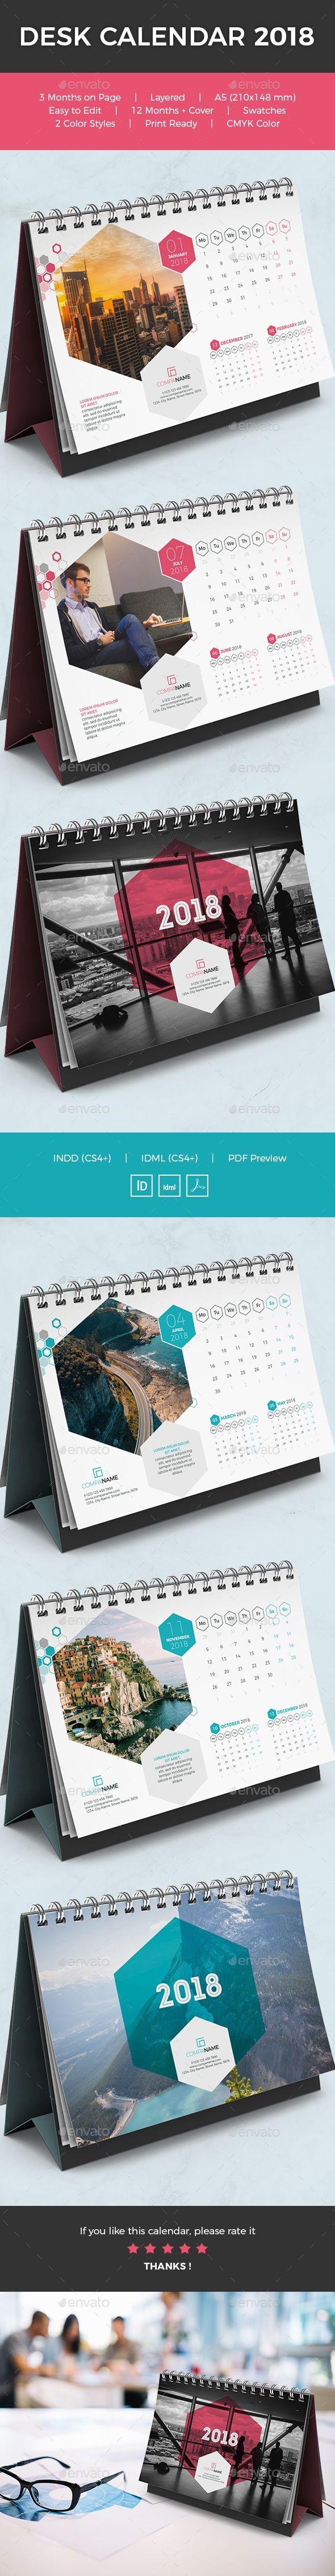 Desk Calendar 2018 Calendars Stationery business calendar 2018 clean pany creative